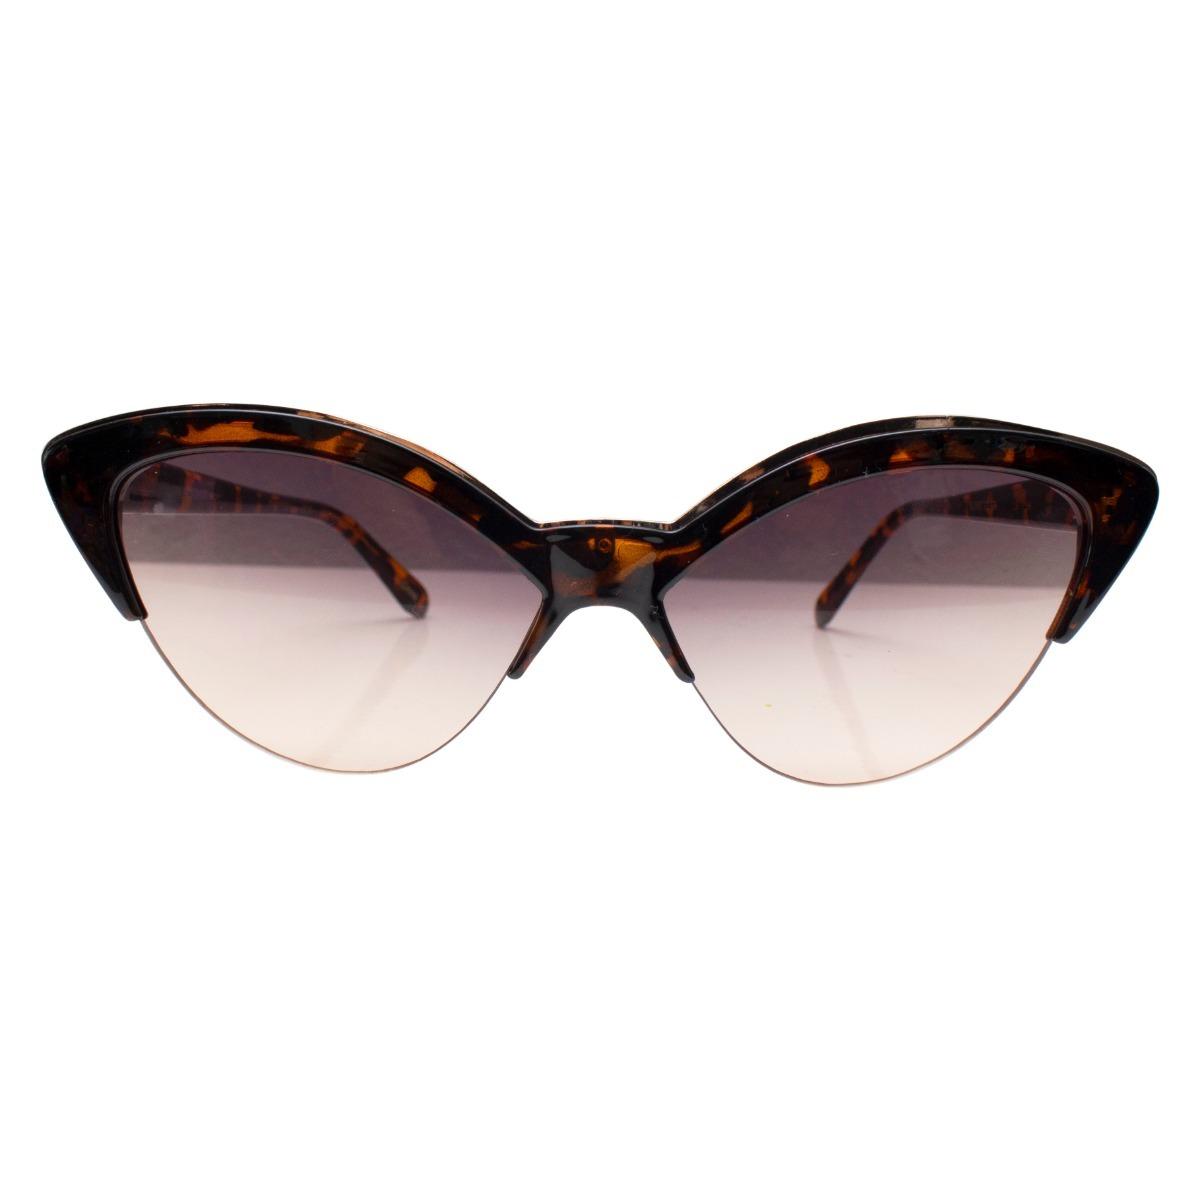 67e98d6038 Lentes De Sol Nicole Lee Thalassia Estilo Cat Eye - $ 309.00 en ...